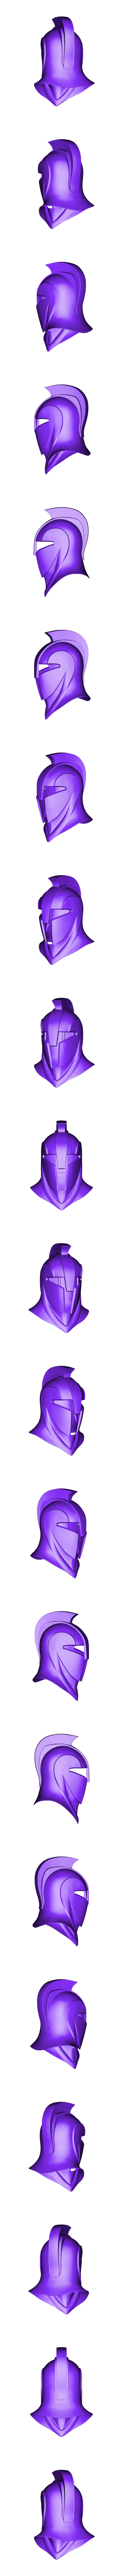 Senate_Guard_Helmet_v2.stl Download free STL file Senate Guard Helmet (Star Wars) • 3D printer design, VillainousPropShop